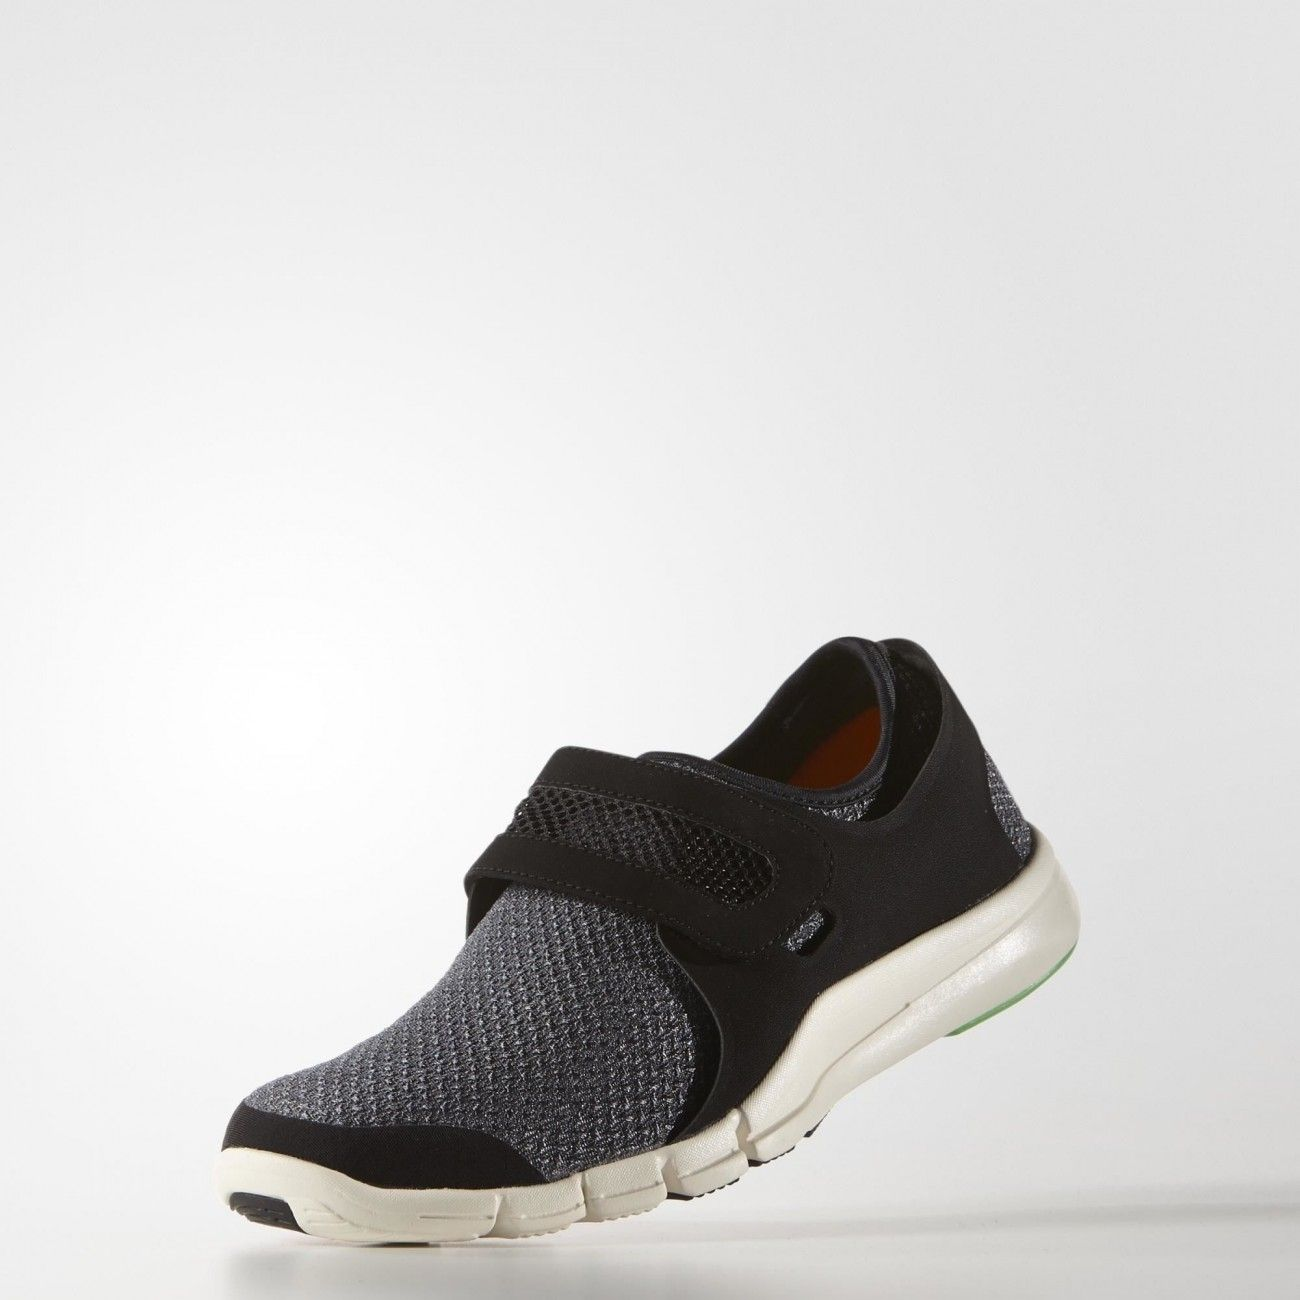 Black Adidas adidas STELLASPORT Zais Shoes B23620